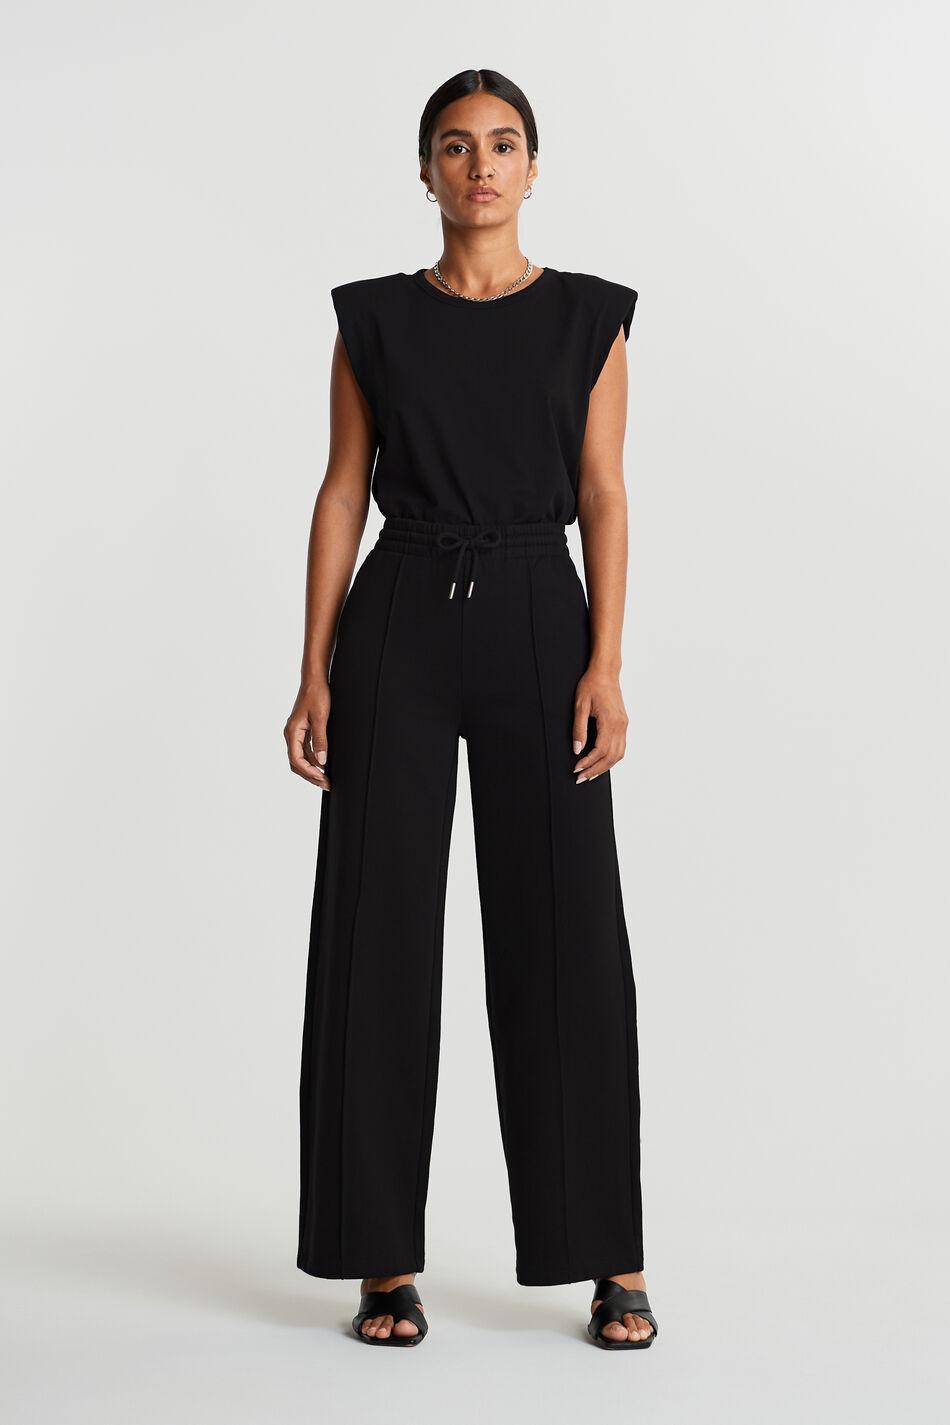 Gina Tricot Bonnie sweatpants S Female Black (9000)